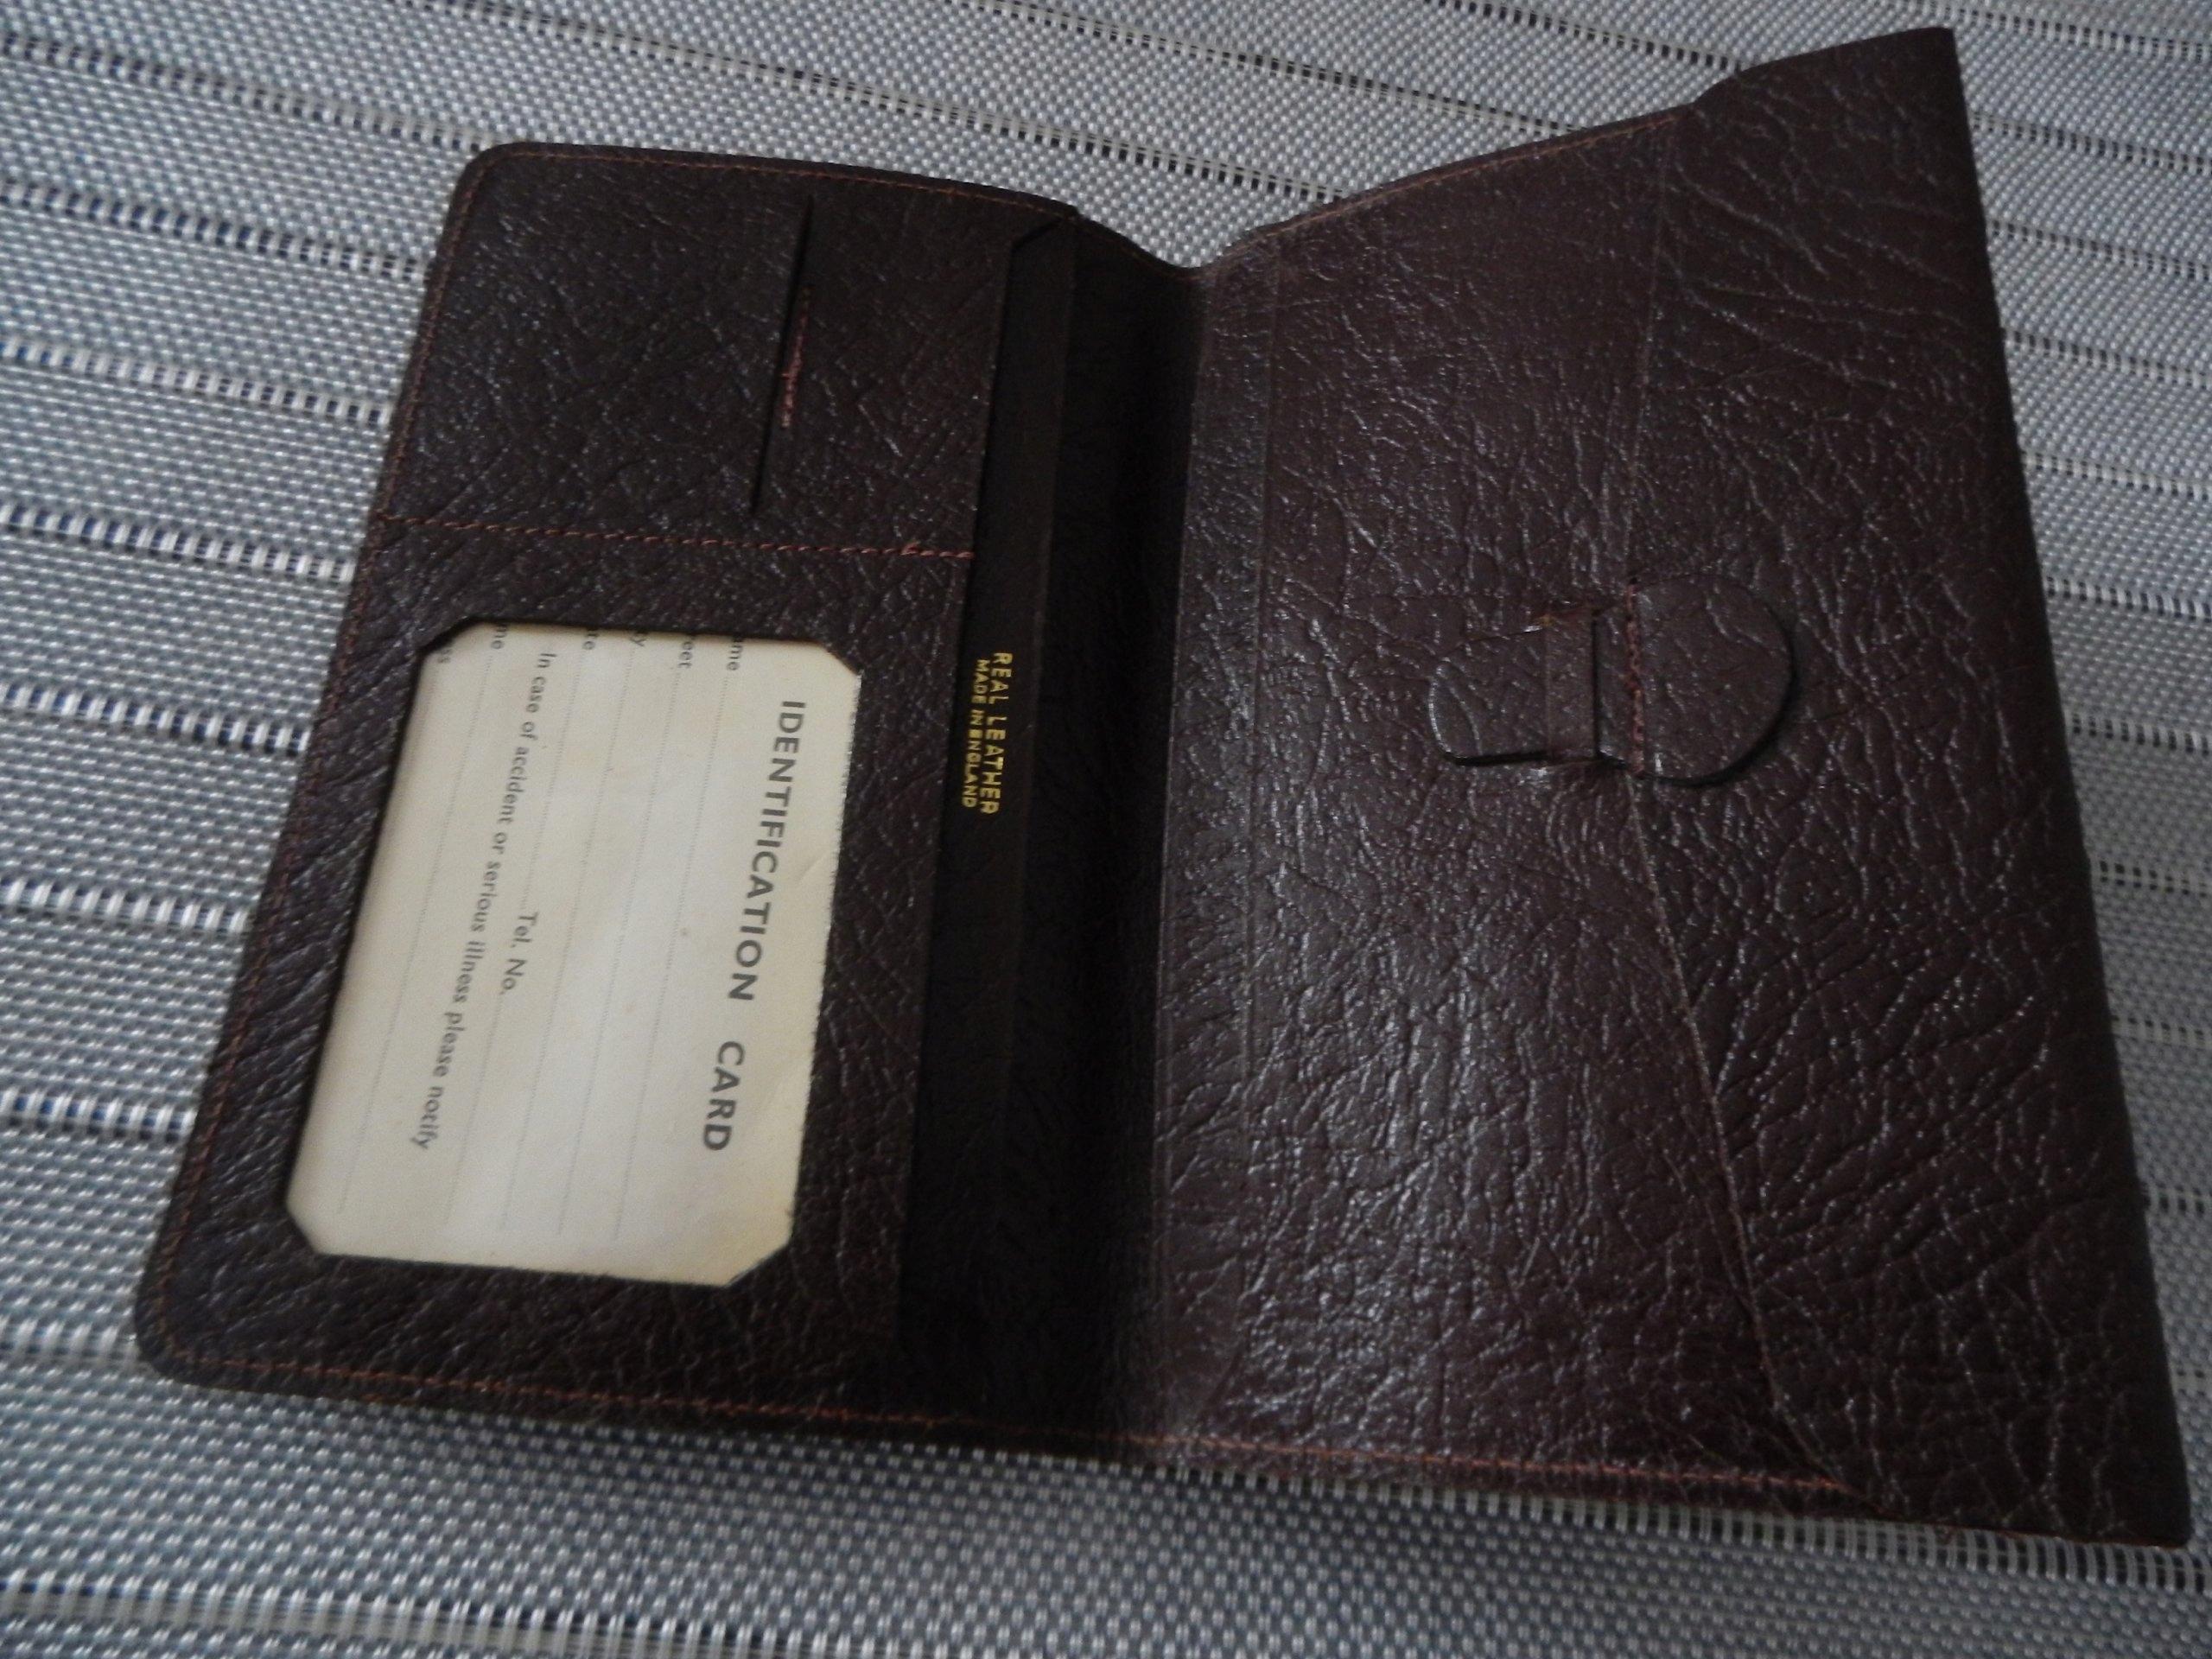 e4b07ad7a860a Portfel męski Real Leather Made in England - 7585845086 - oficjalne ...